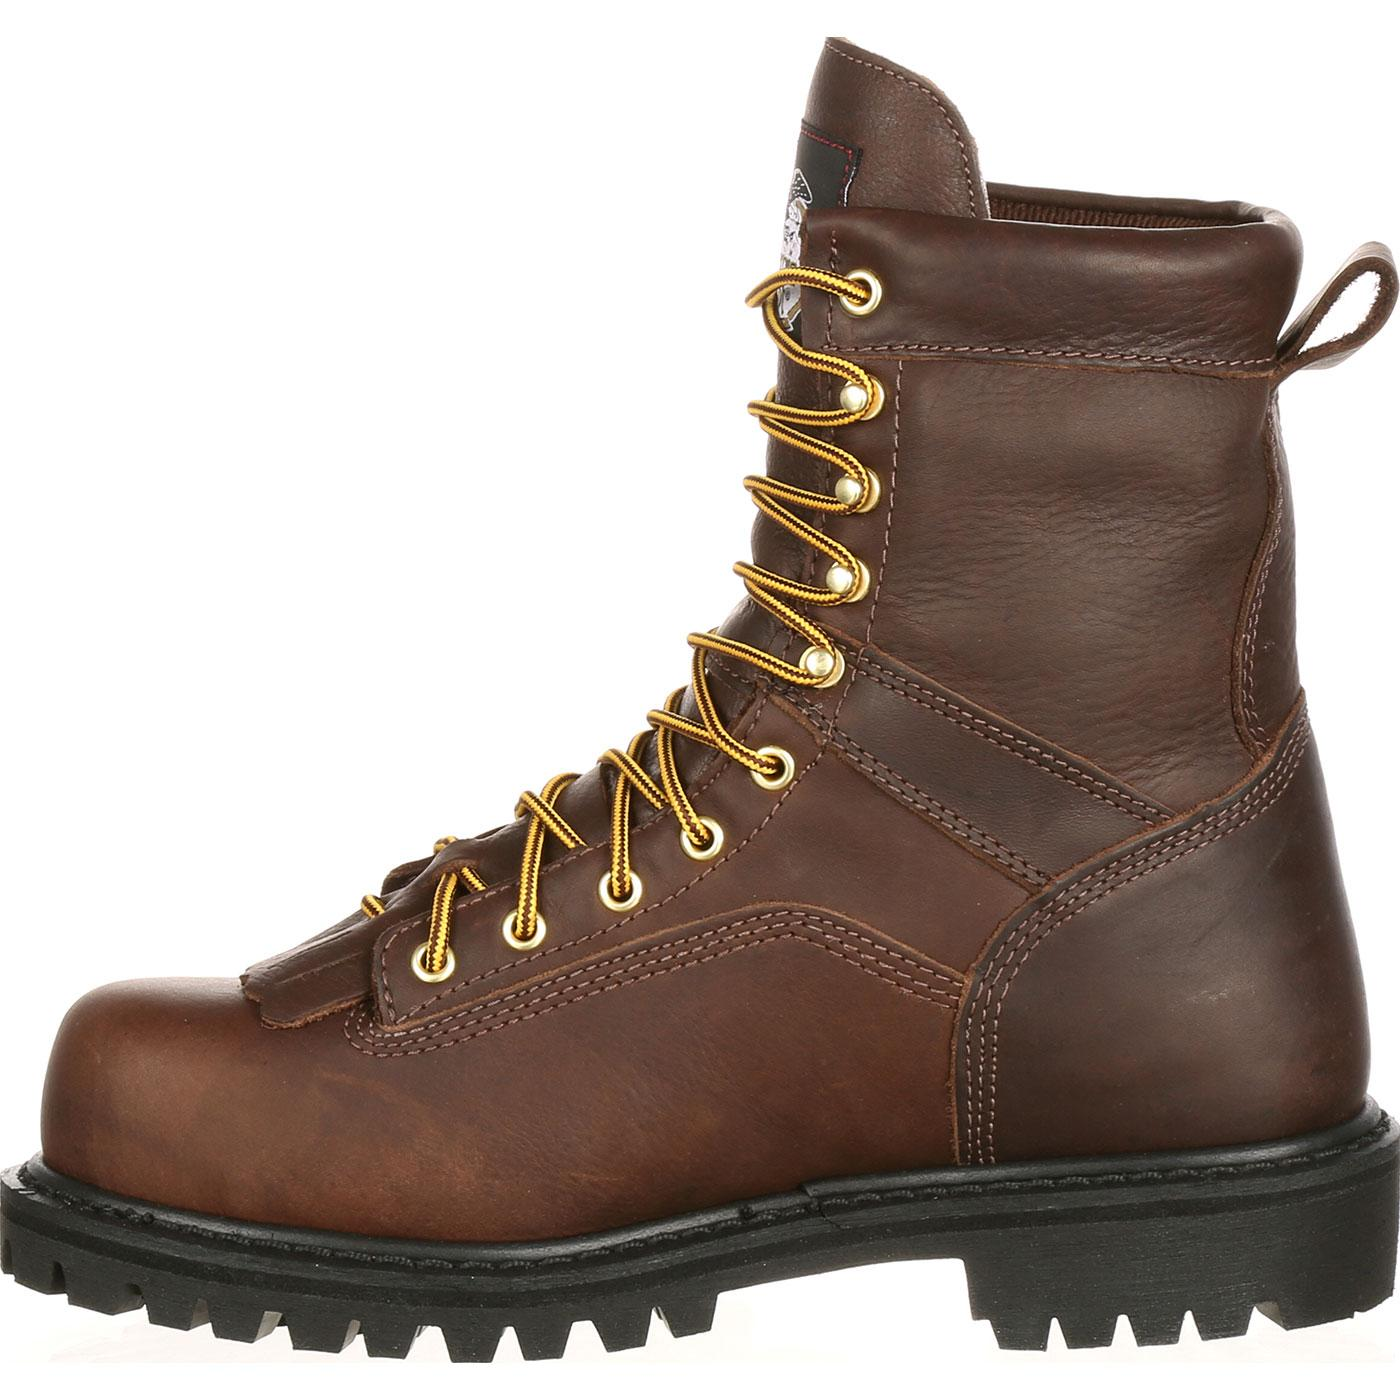 Georgia Boot Lace To Toe Waterproof Work Boot G8041